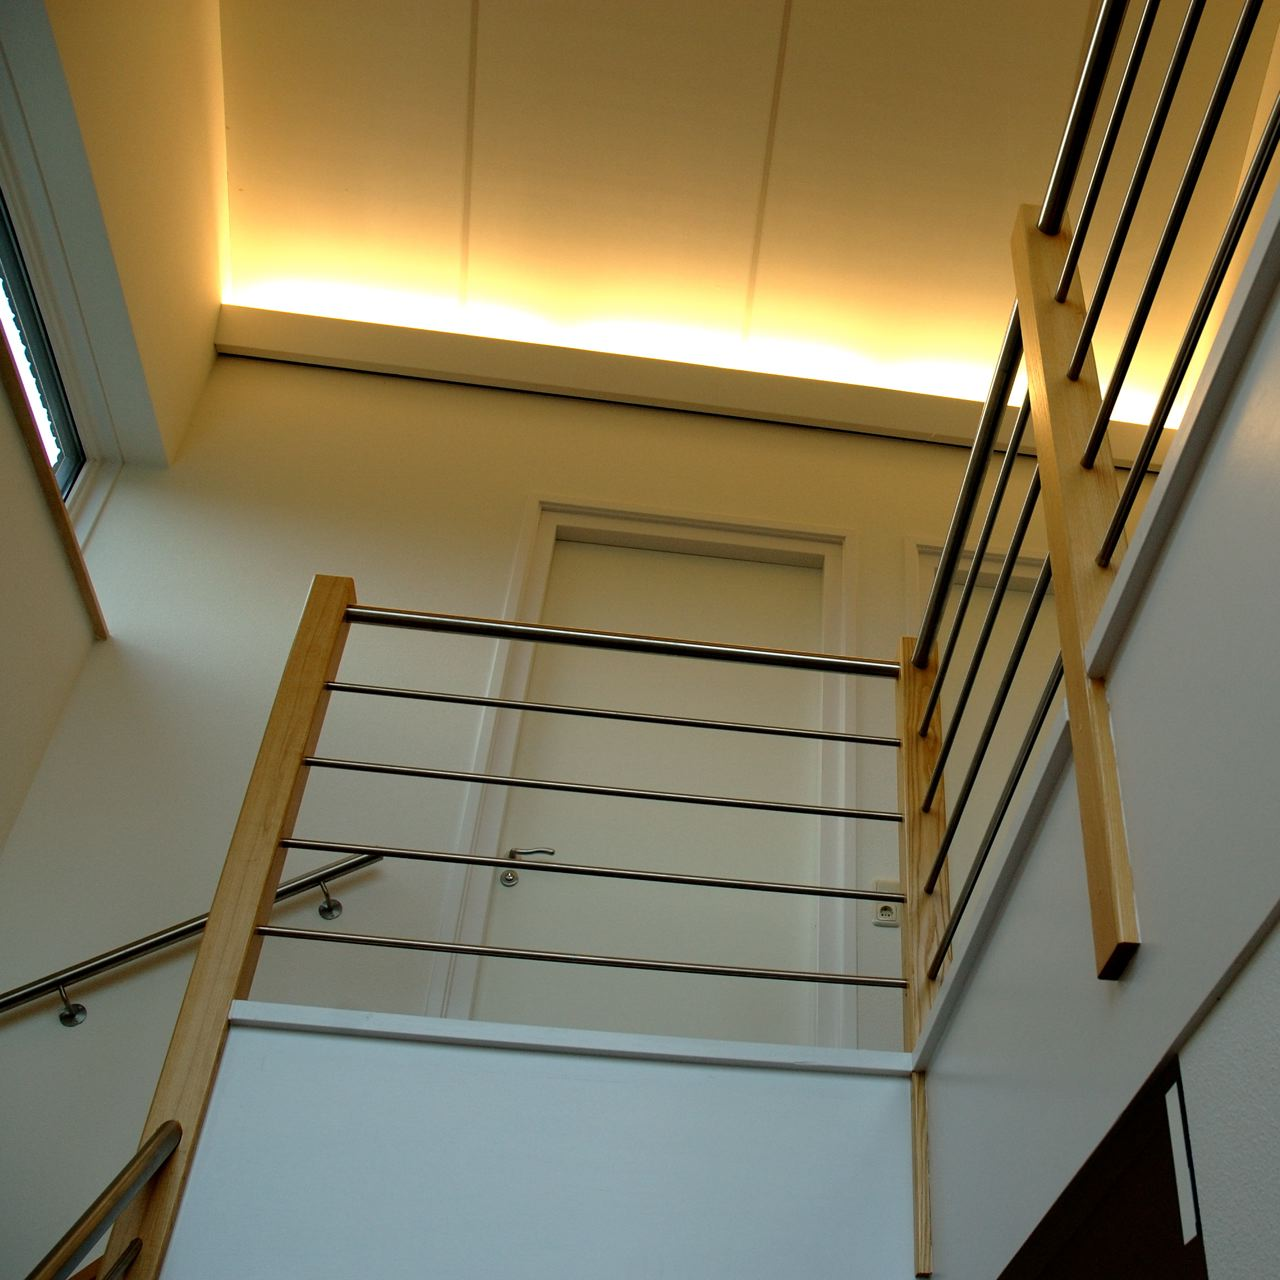 1+nieuwbouw,+entree,+trapopgang,+verlichting.jpg